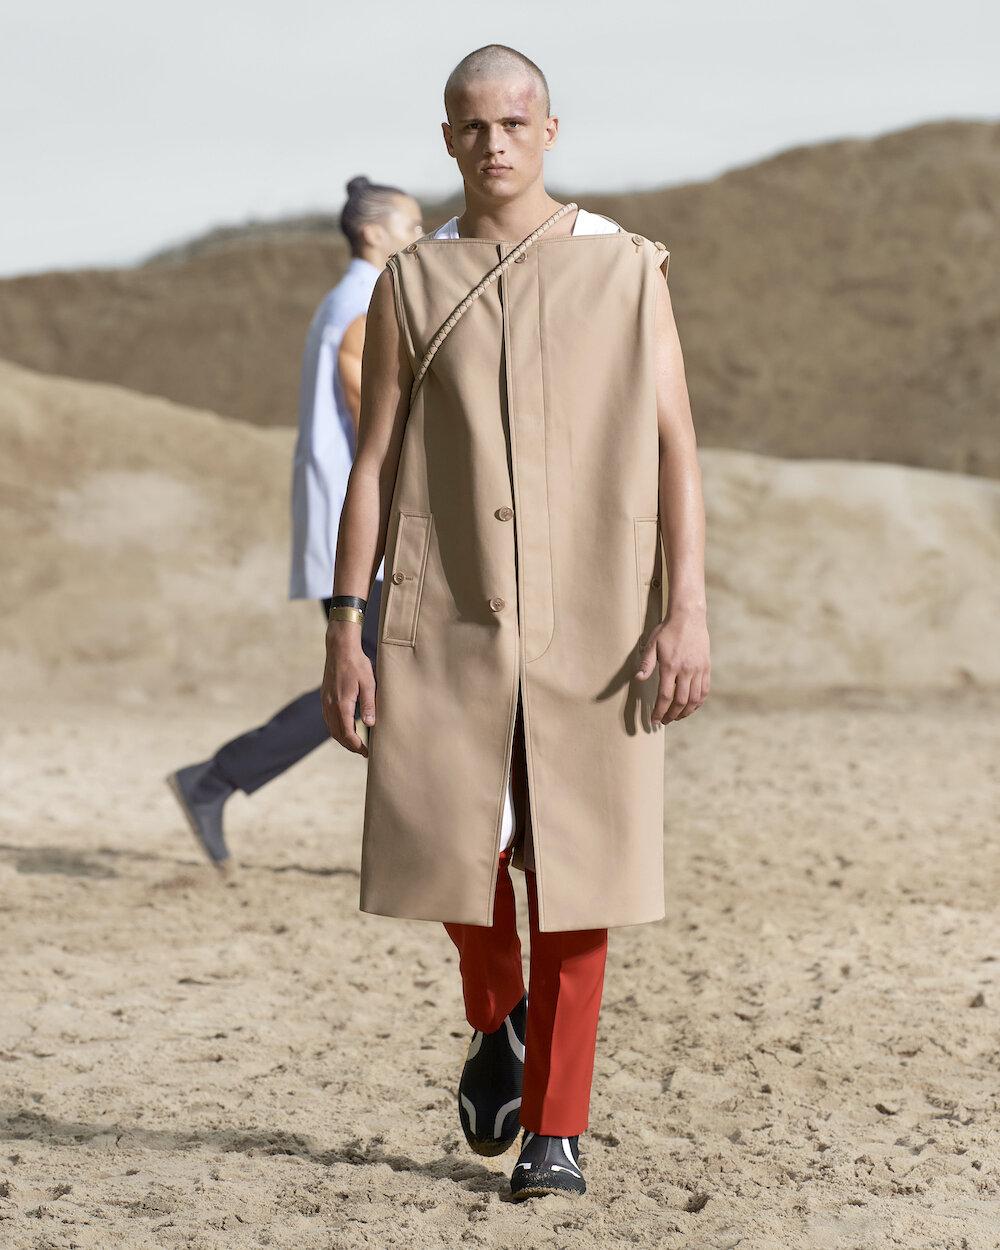 Burberry Spring_Summer 2022 Menswear Presentation Collection - Look 45 - Ben.jpg